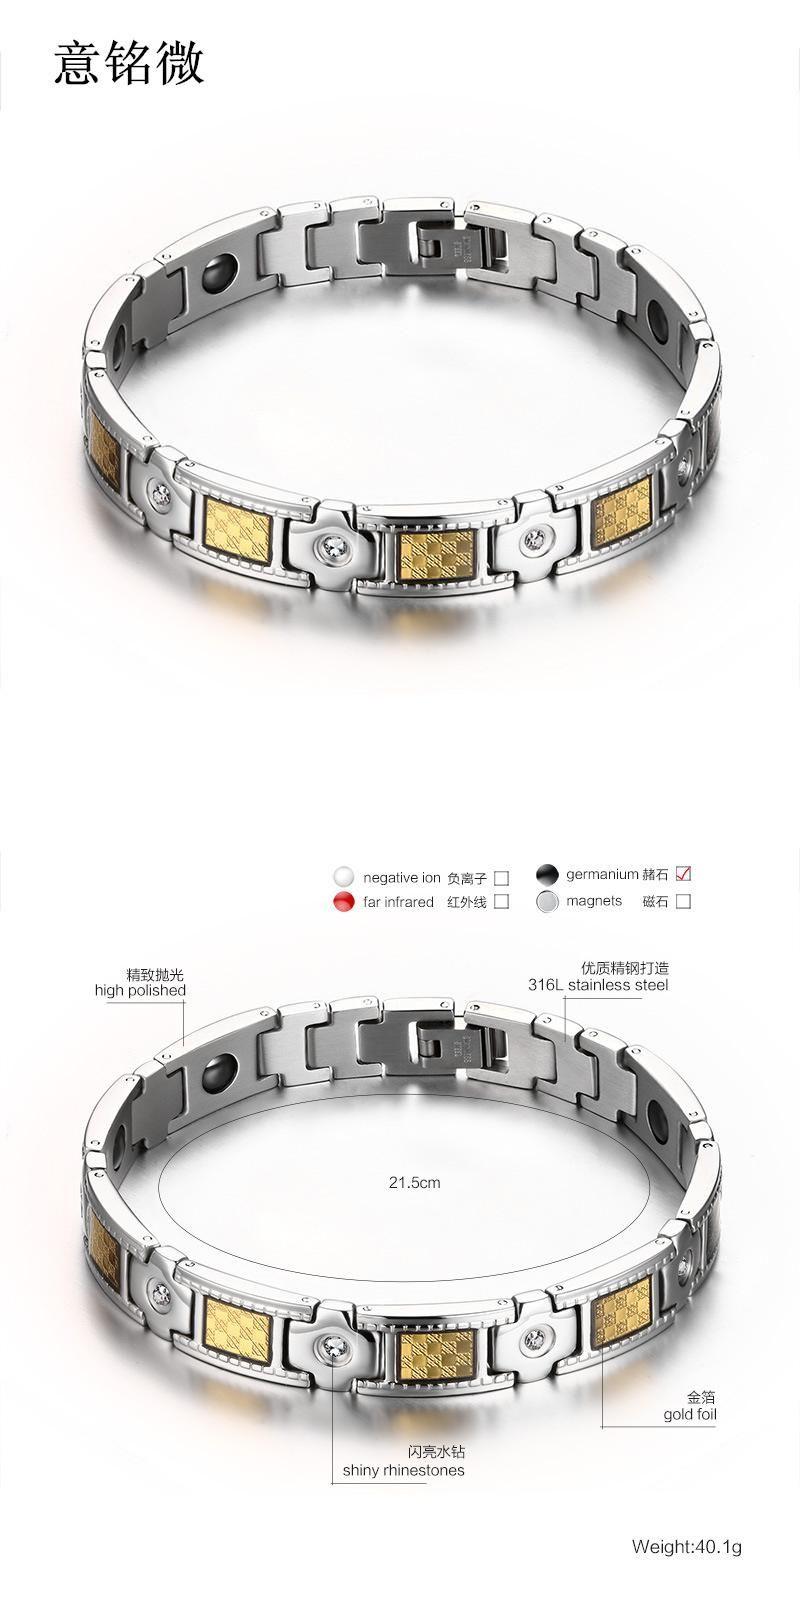 Visit to buy new fashion jewelry men health bracelet l